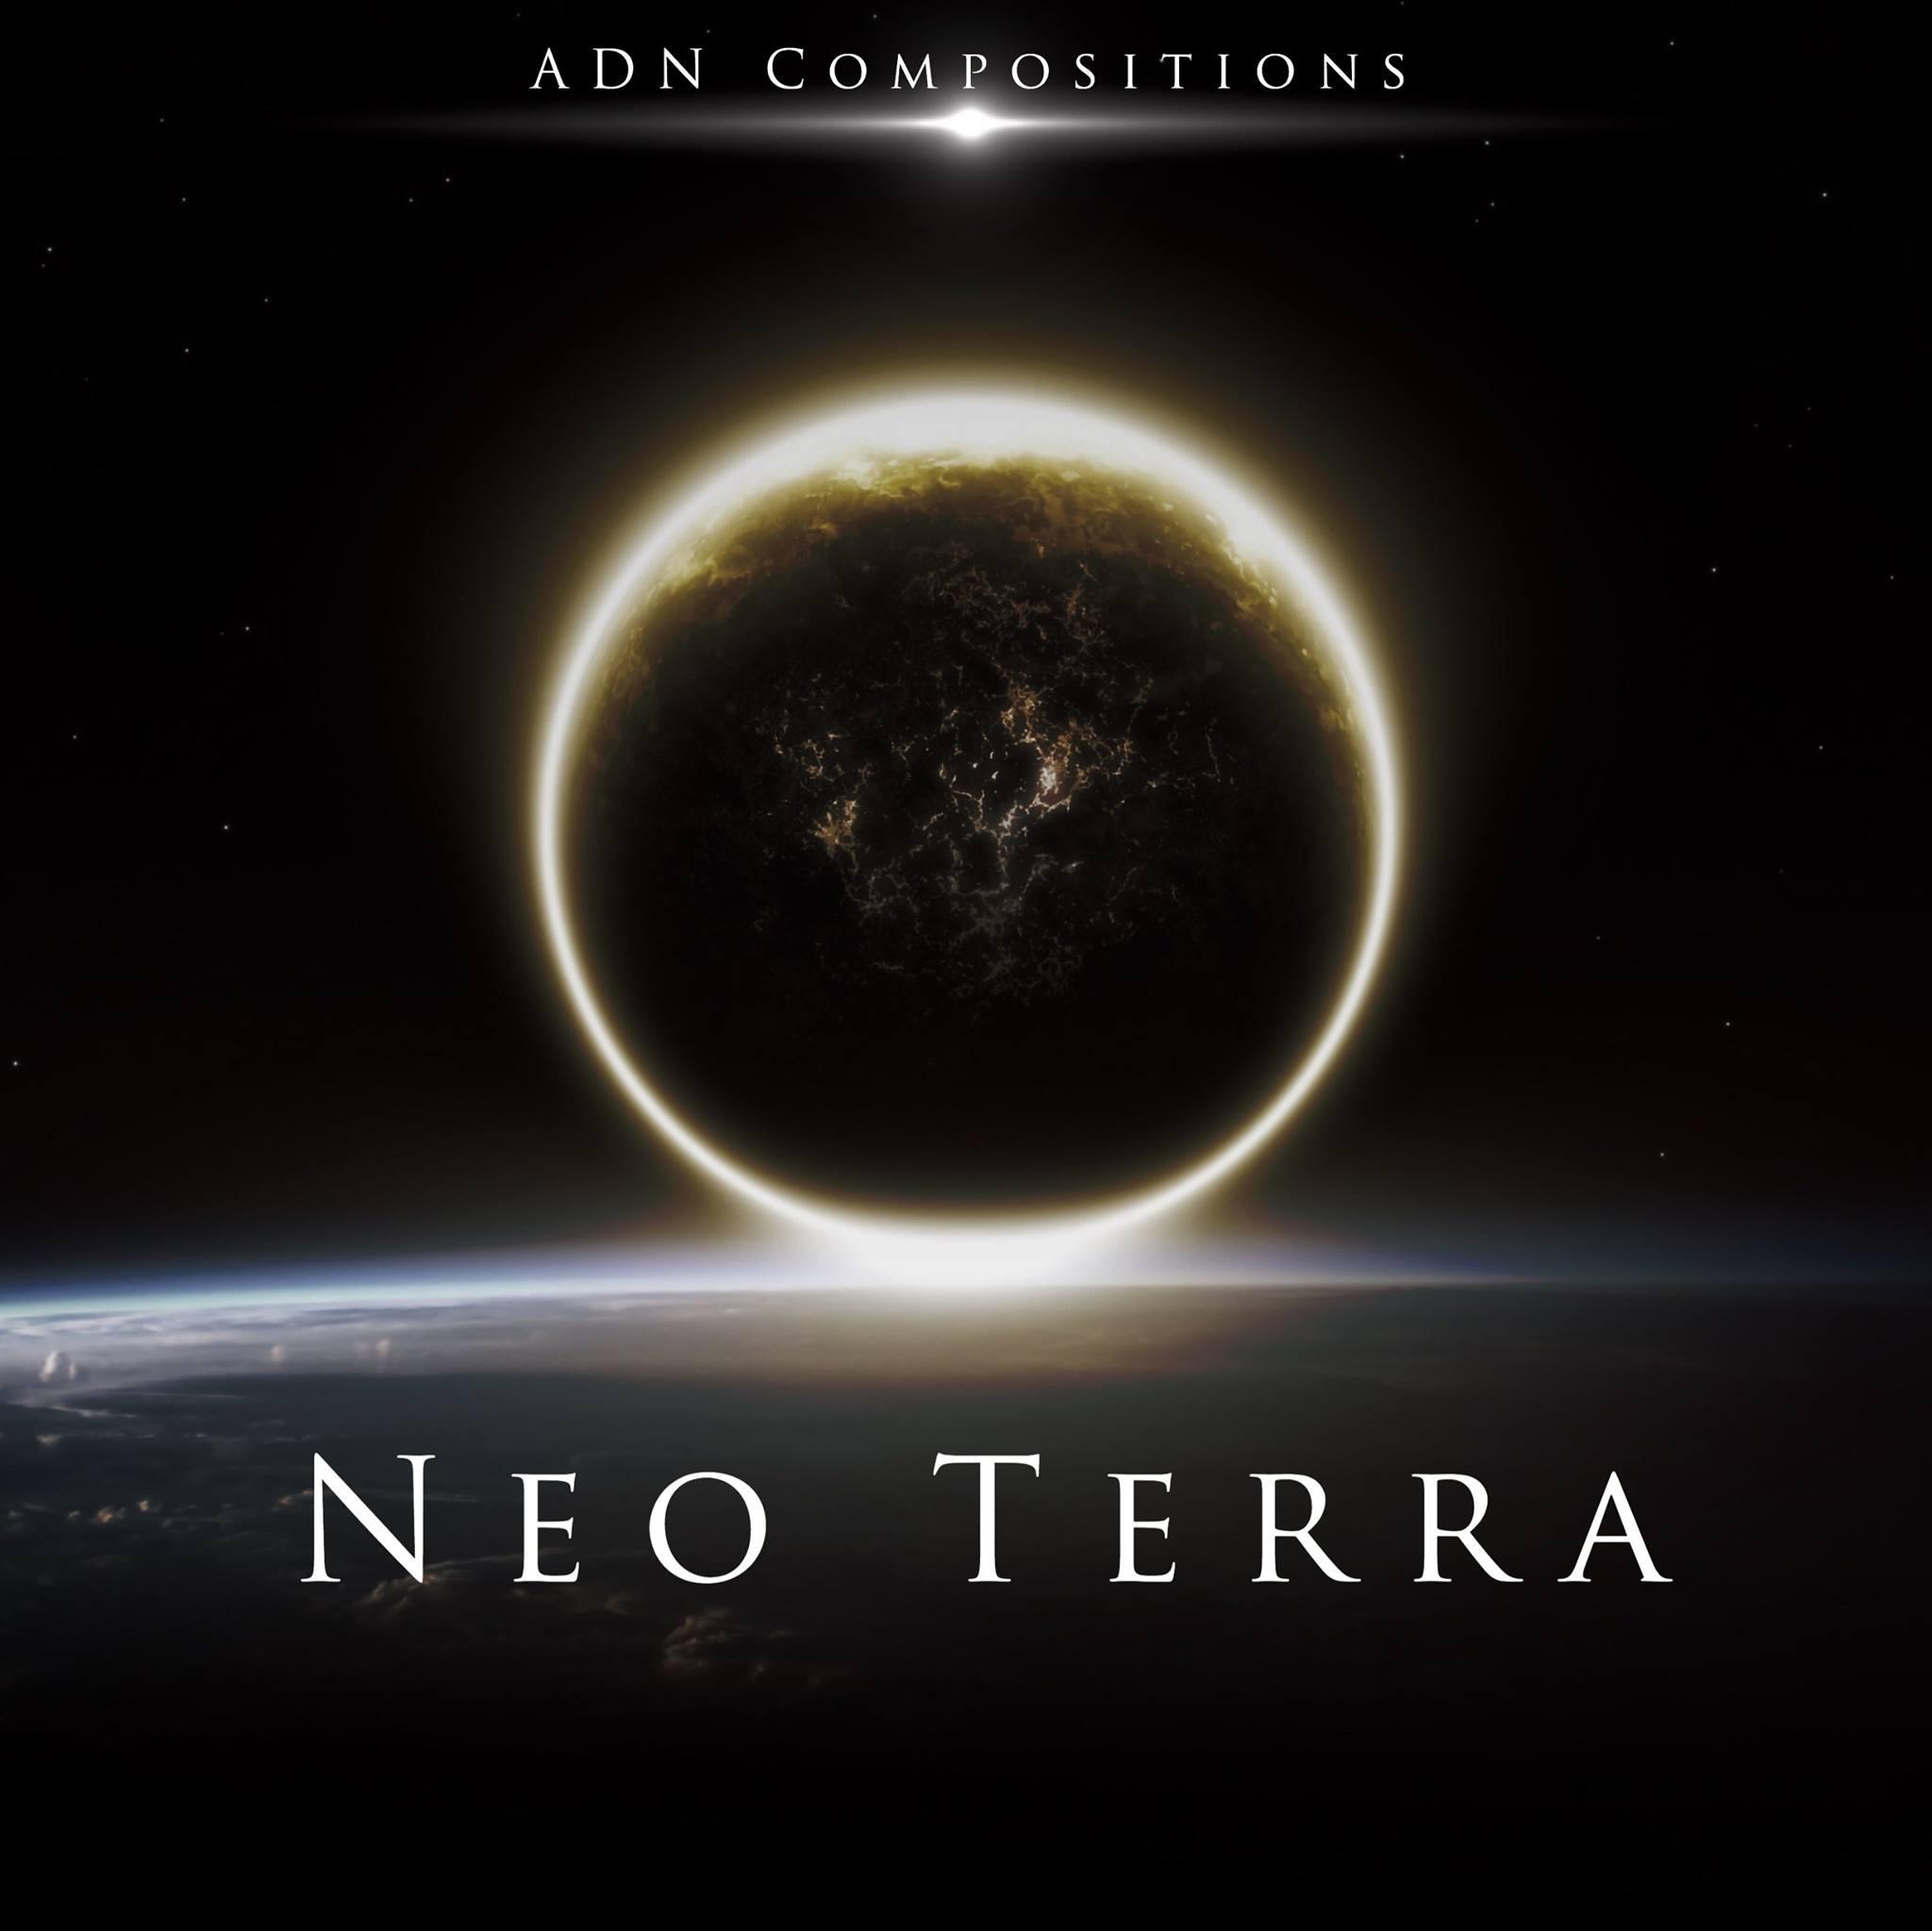 Neo Terra